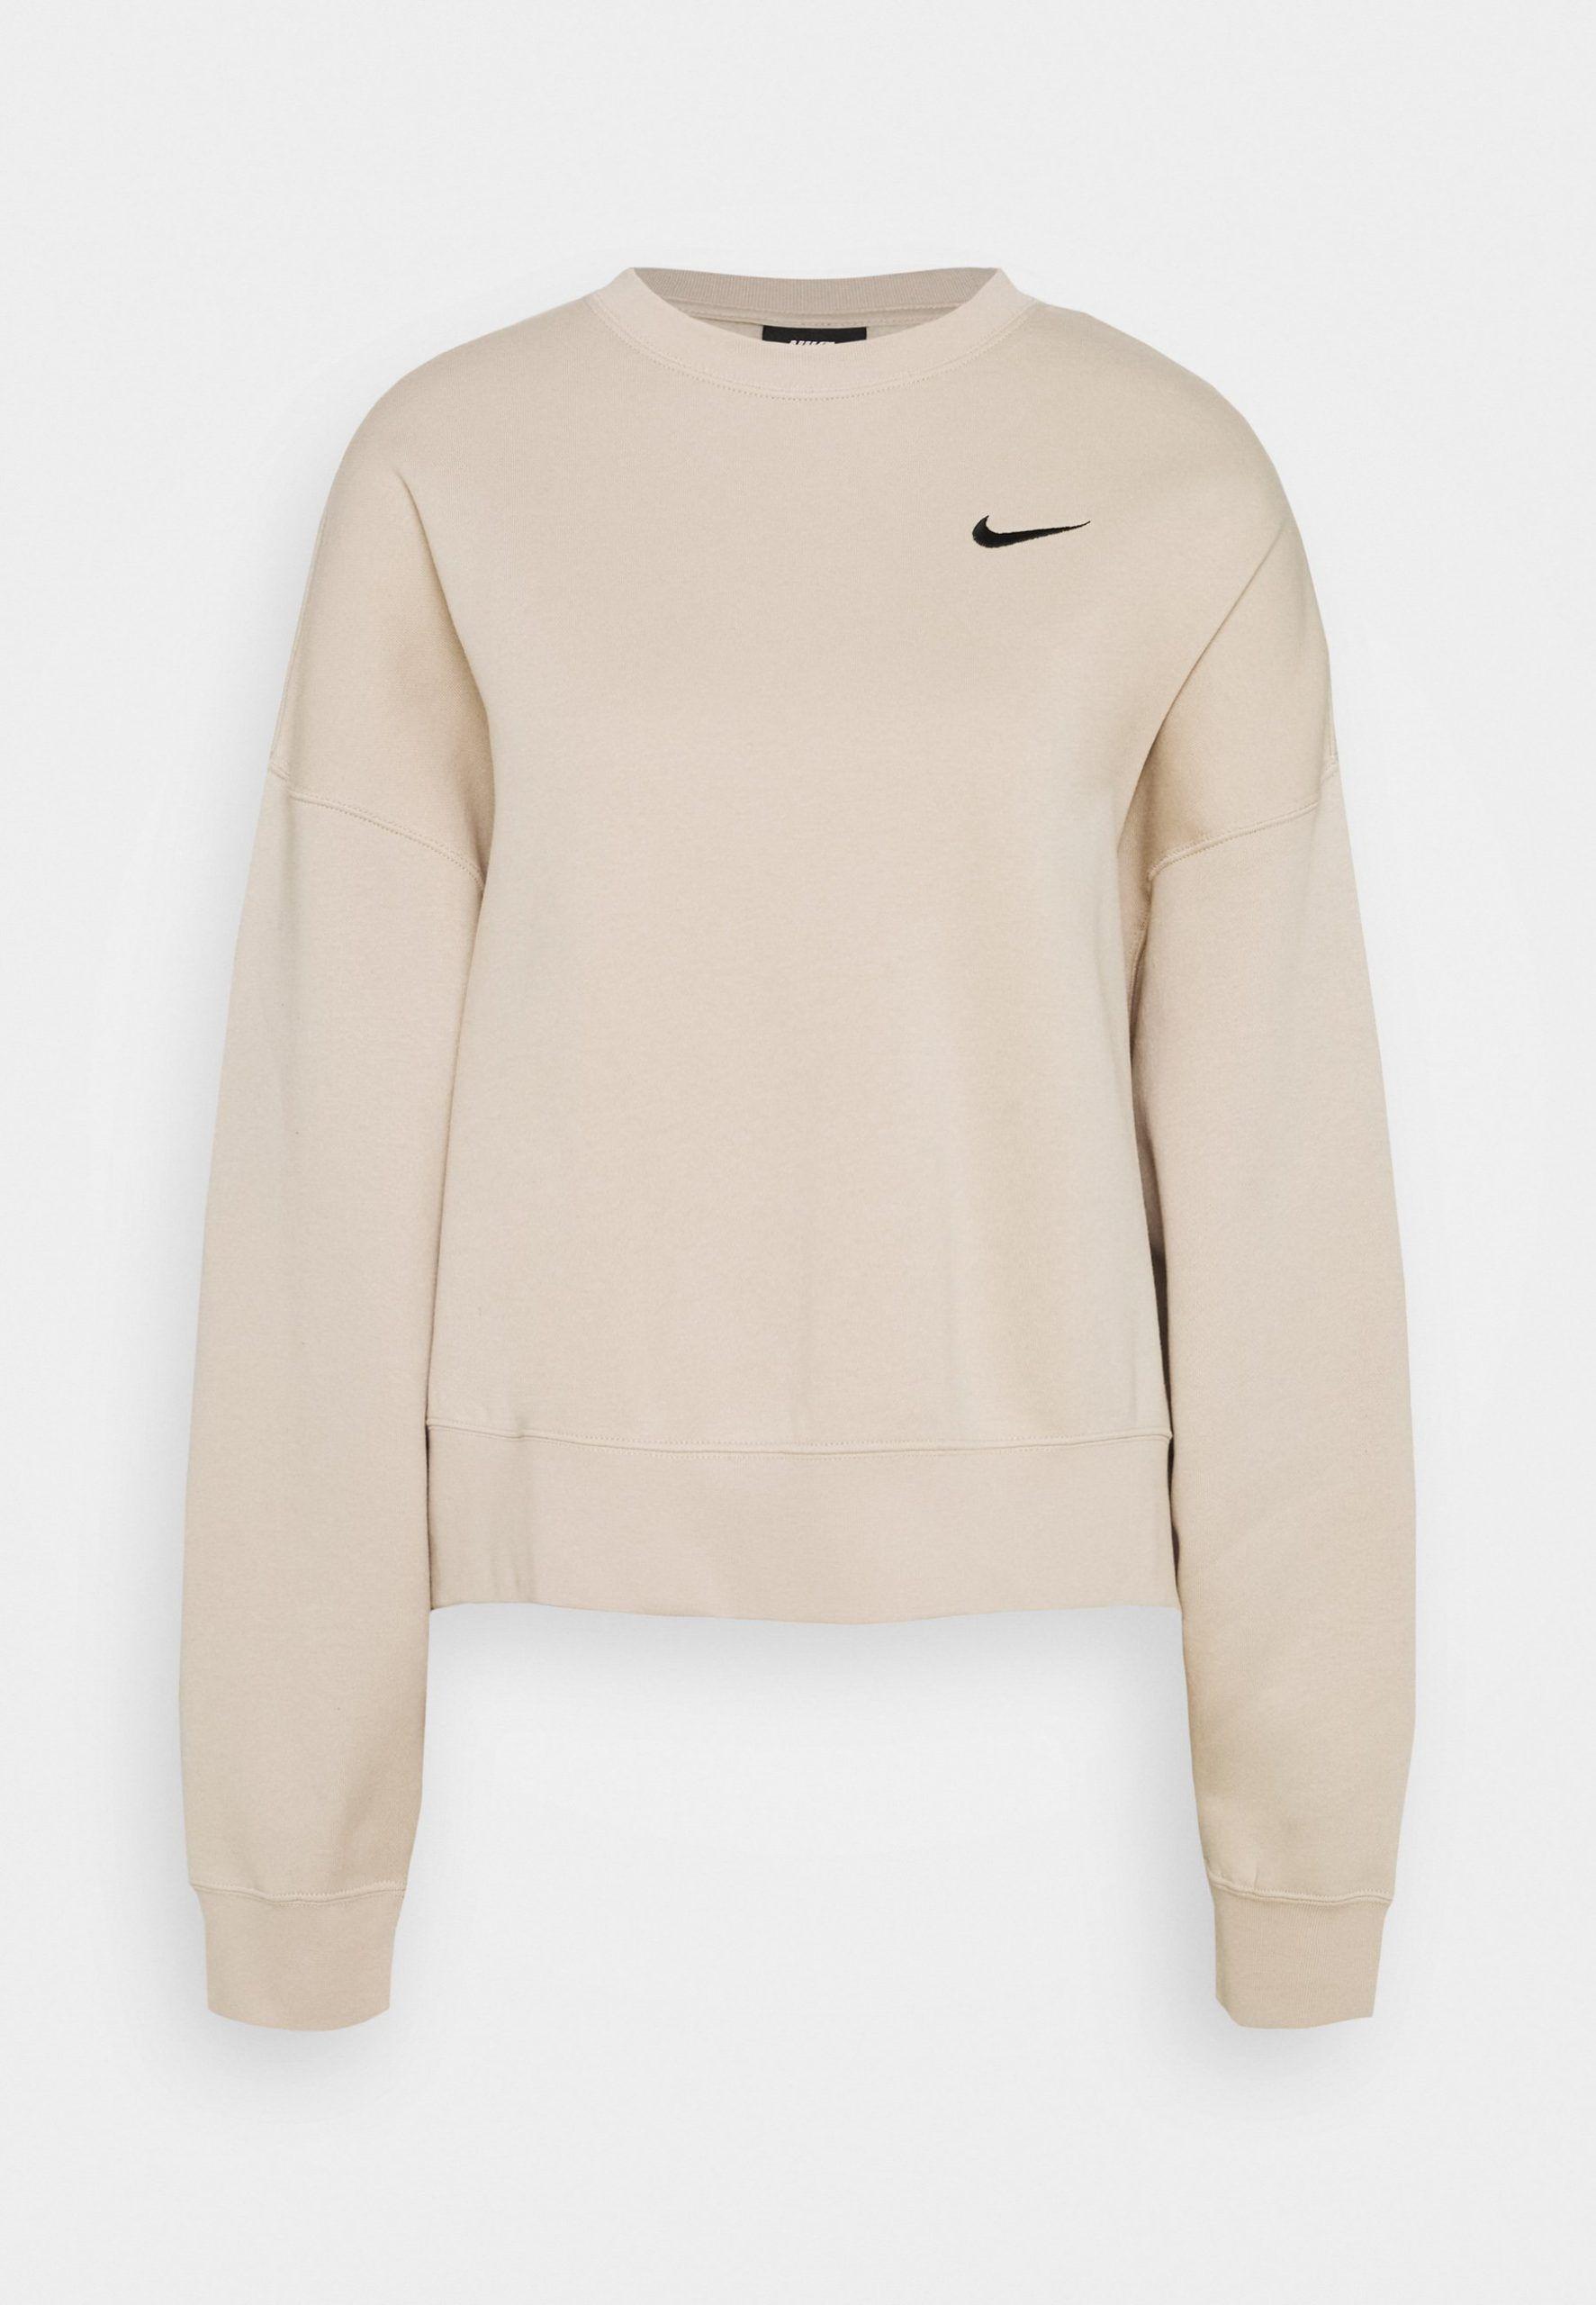 Nike Oatmeal Sweatshirt Sweater Trends Sweatshirts Beige Sweatshirt [ 2560 x 1773 Pixel ]